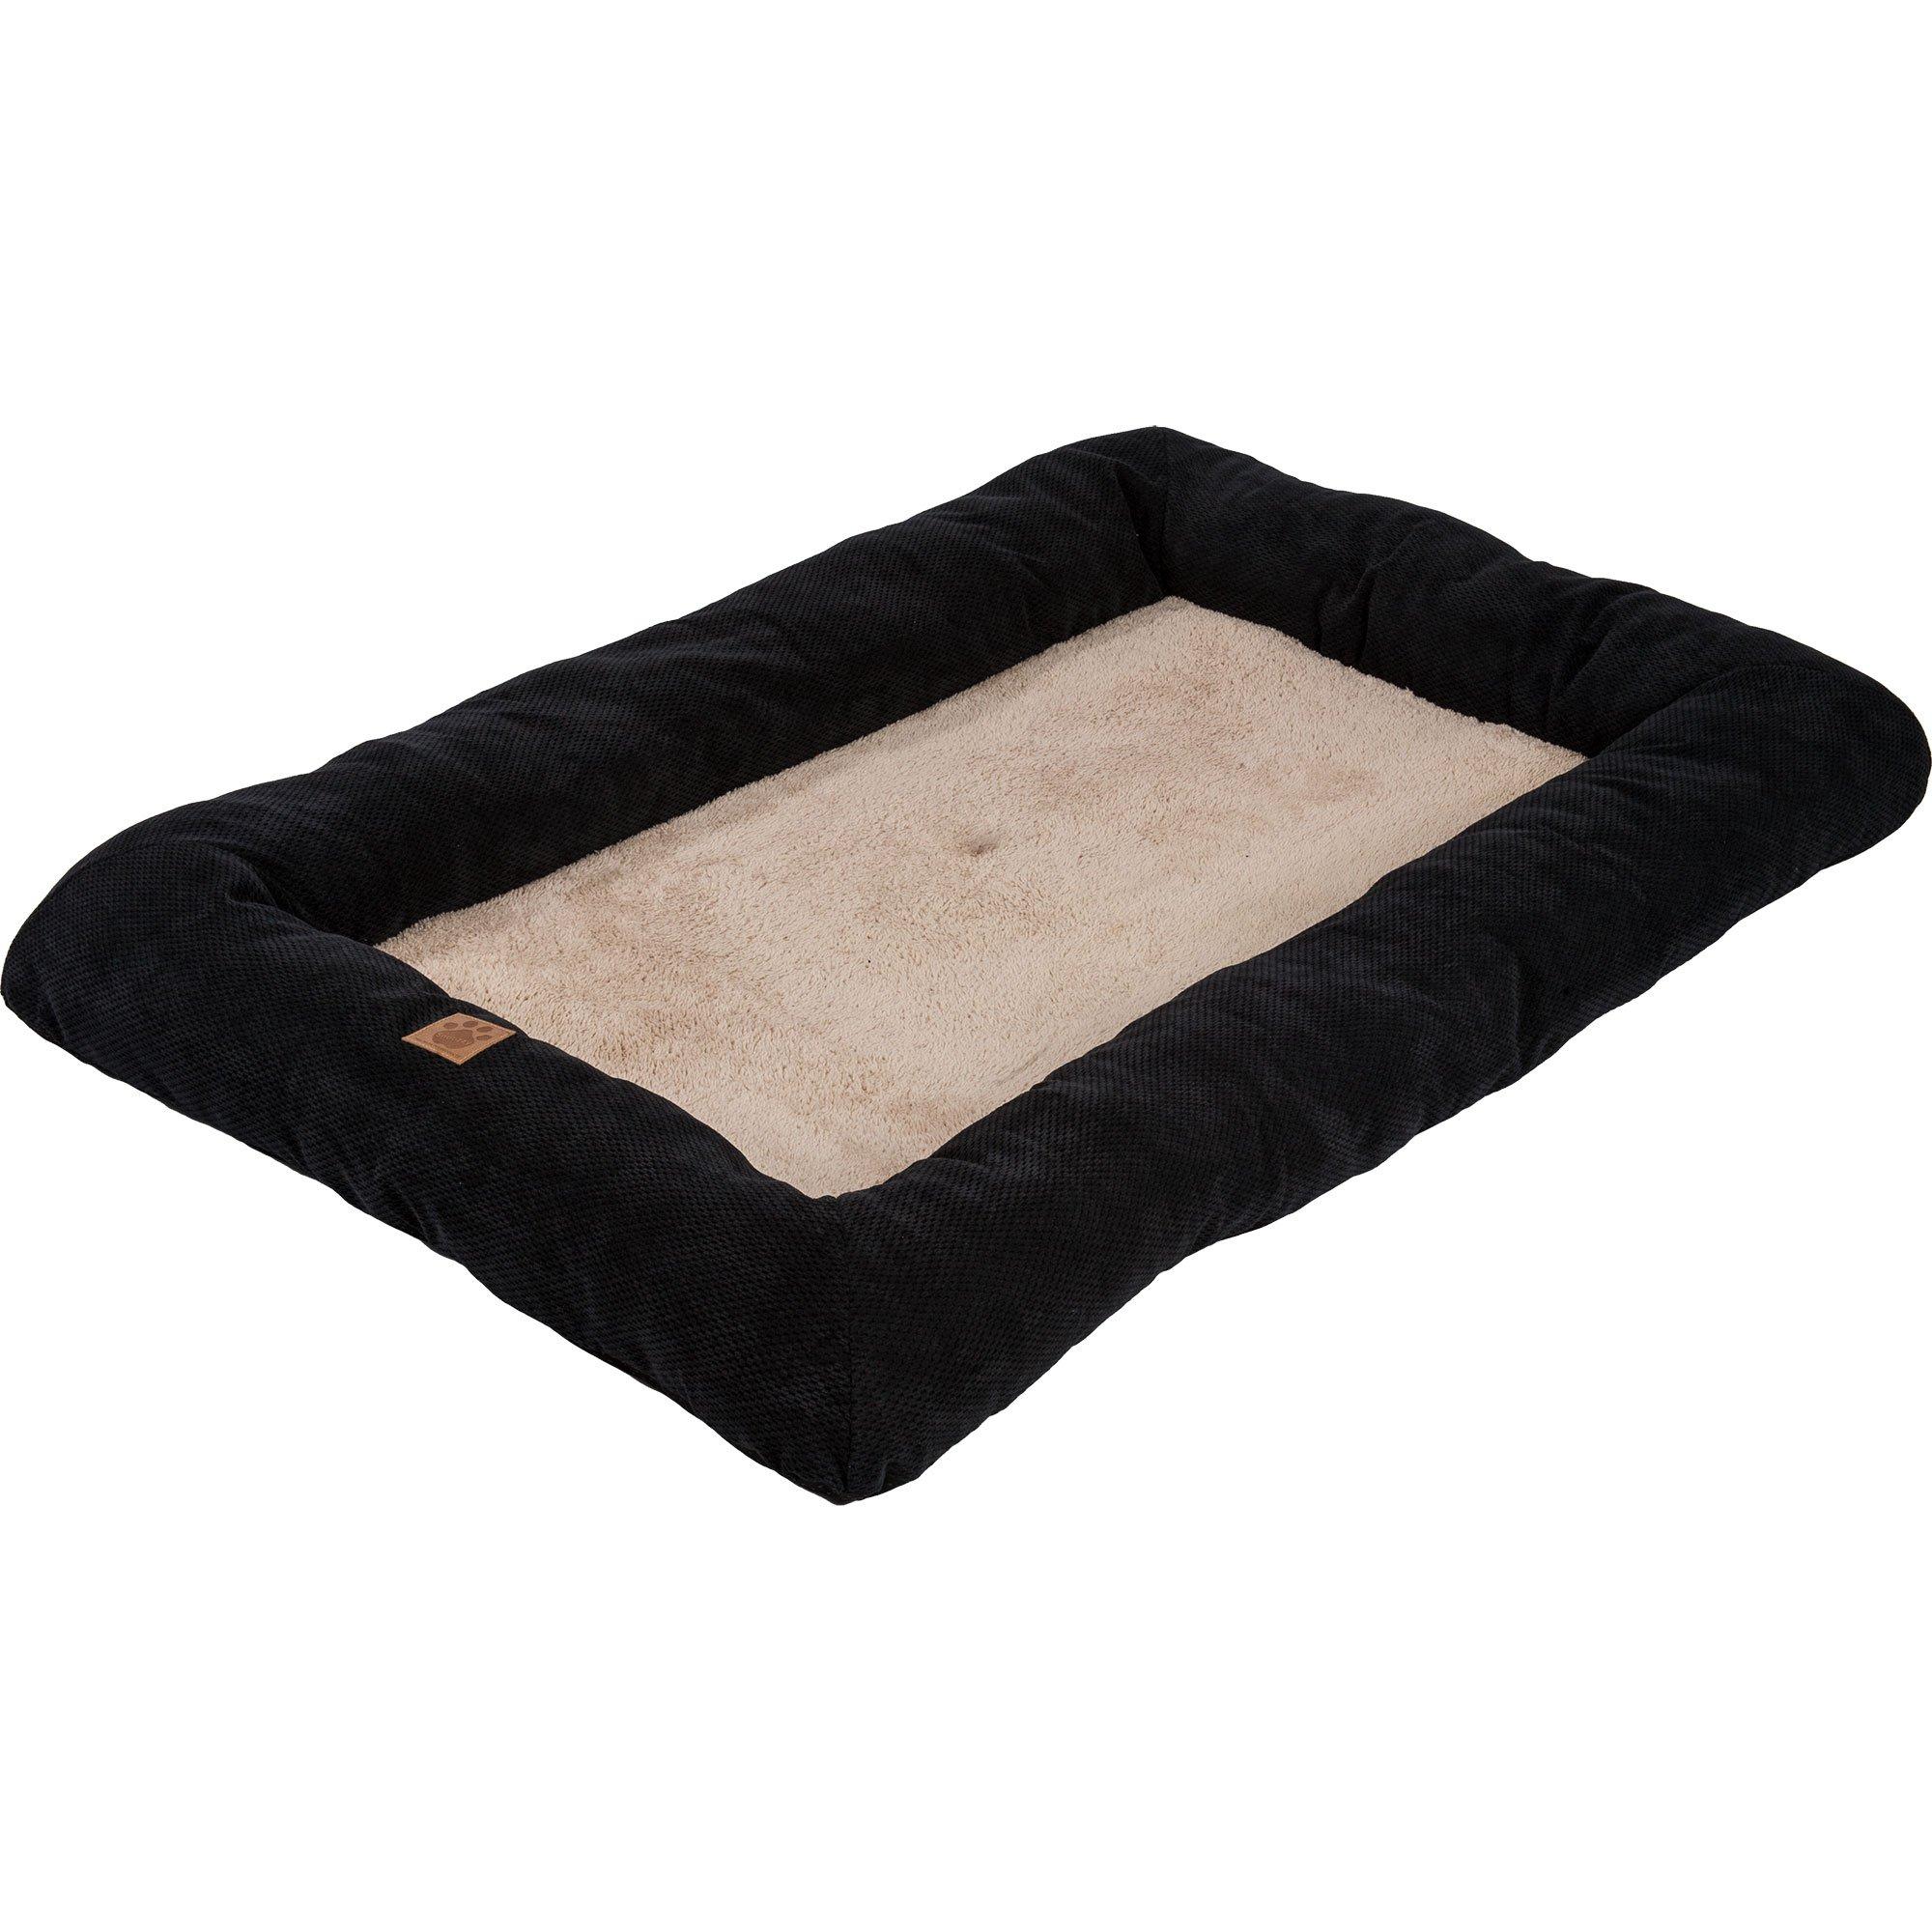 Precision Pet SnooZZy Mod Chic Low Bumper Mat, 6000 Black